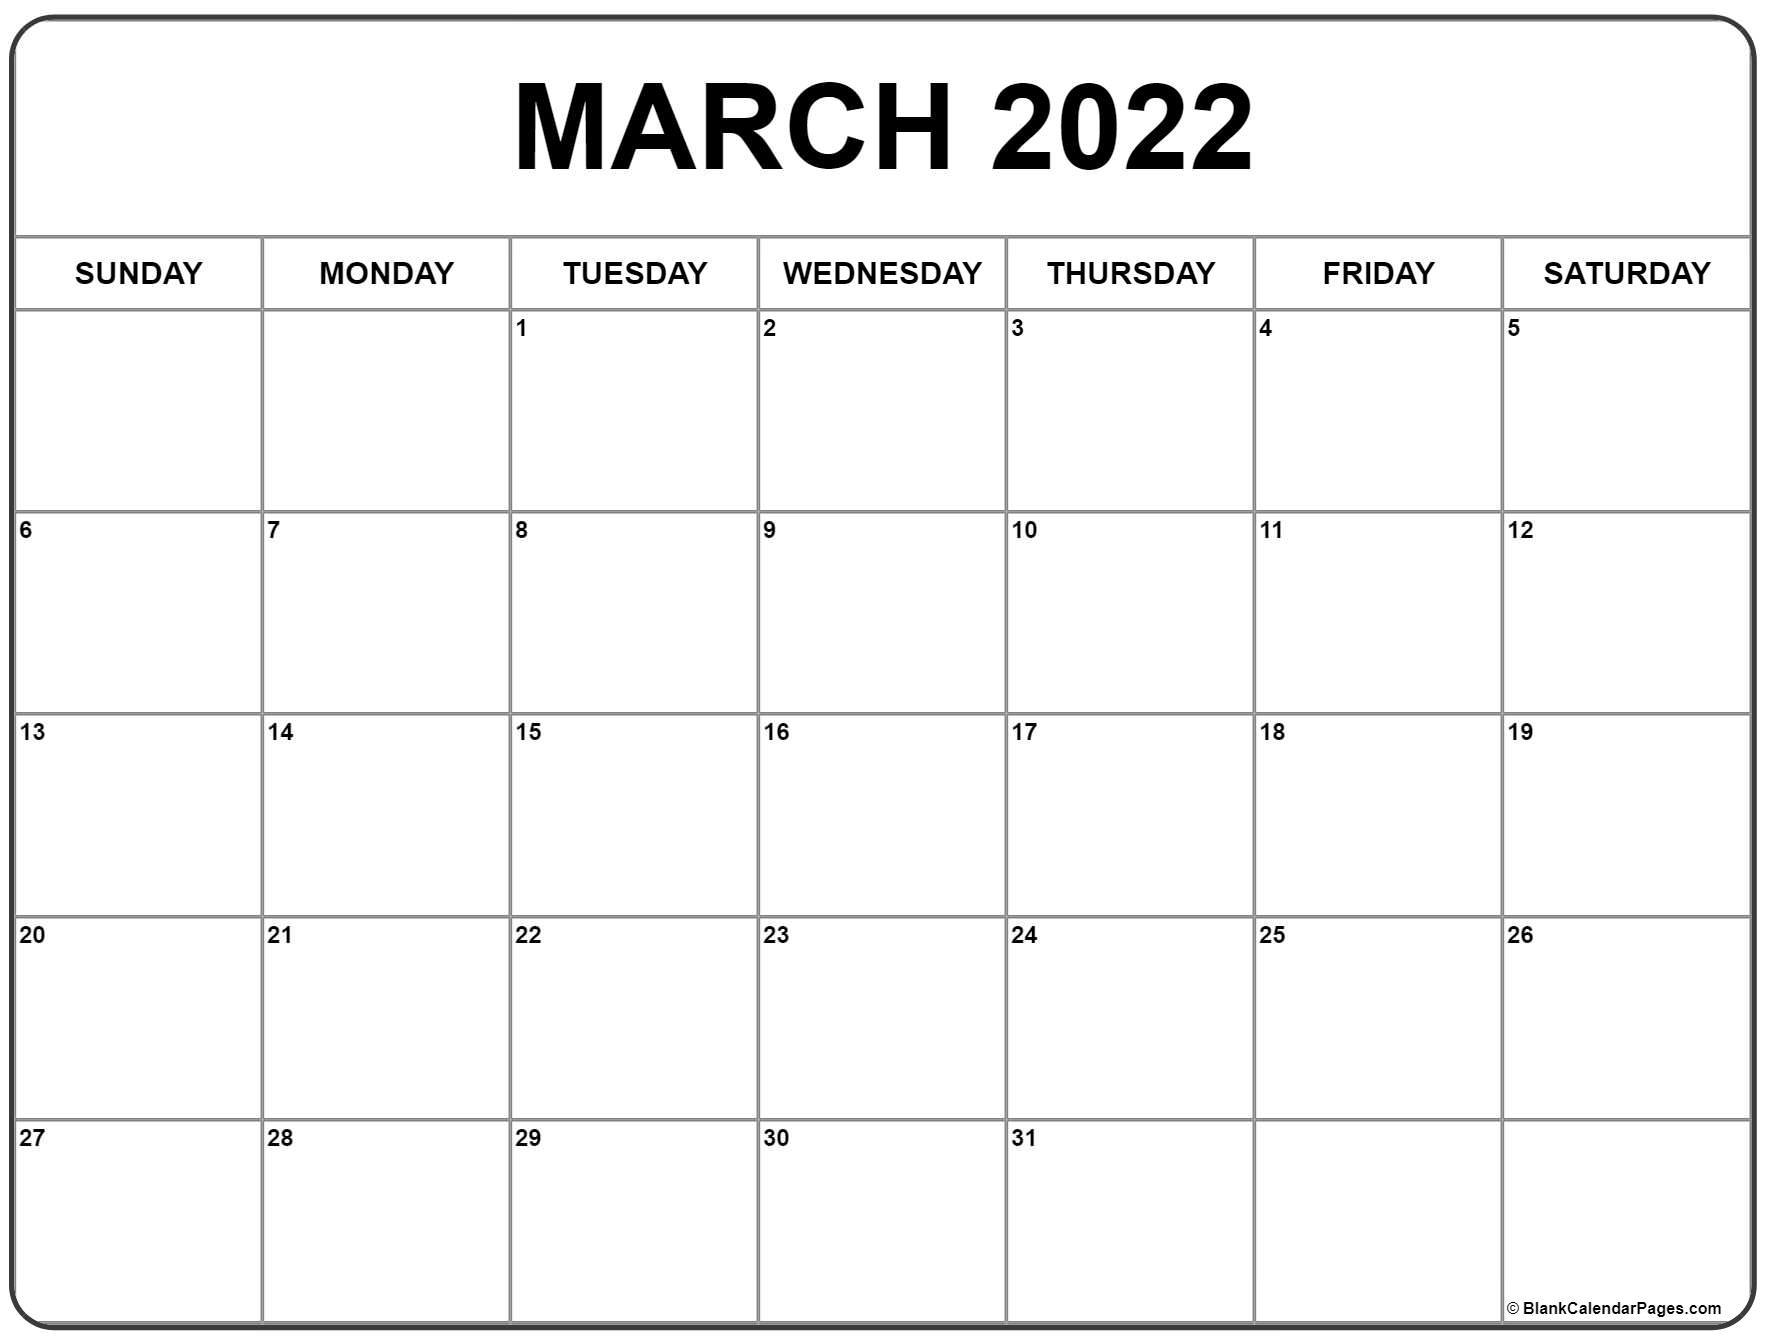 March 2022 Calendar | Free Printable Calendar Templates Pertaining To February March 2022 Calendar